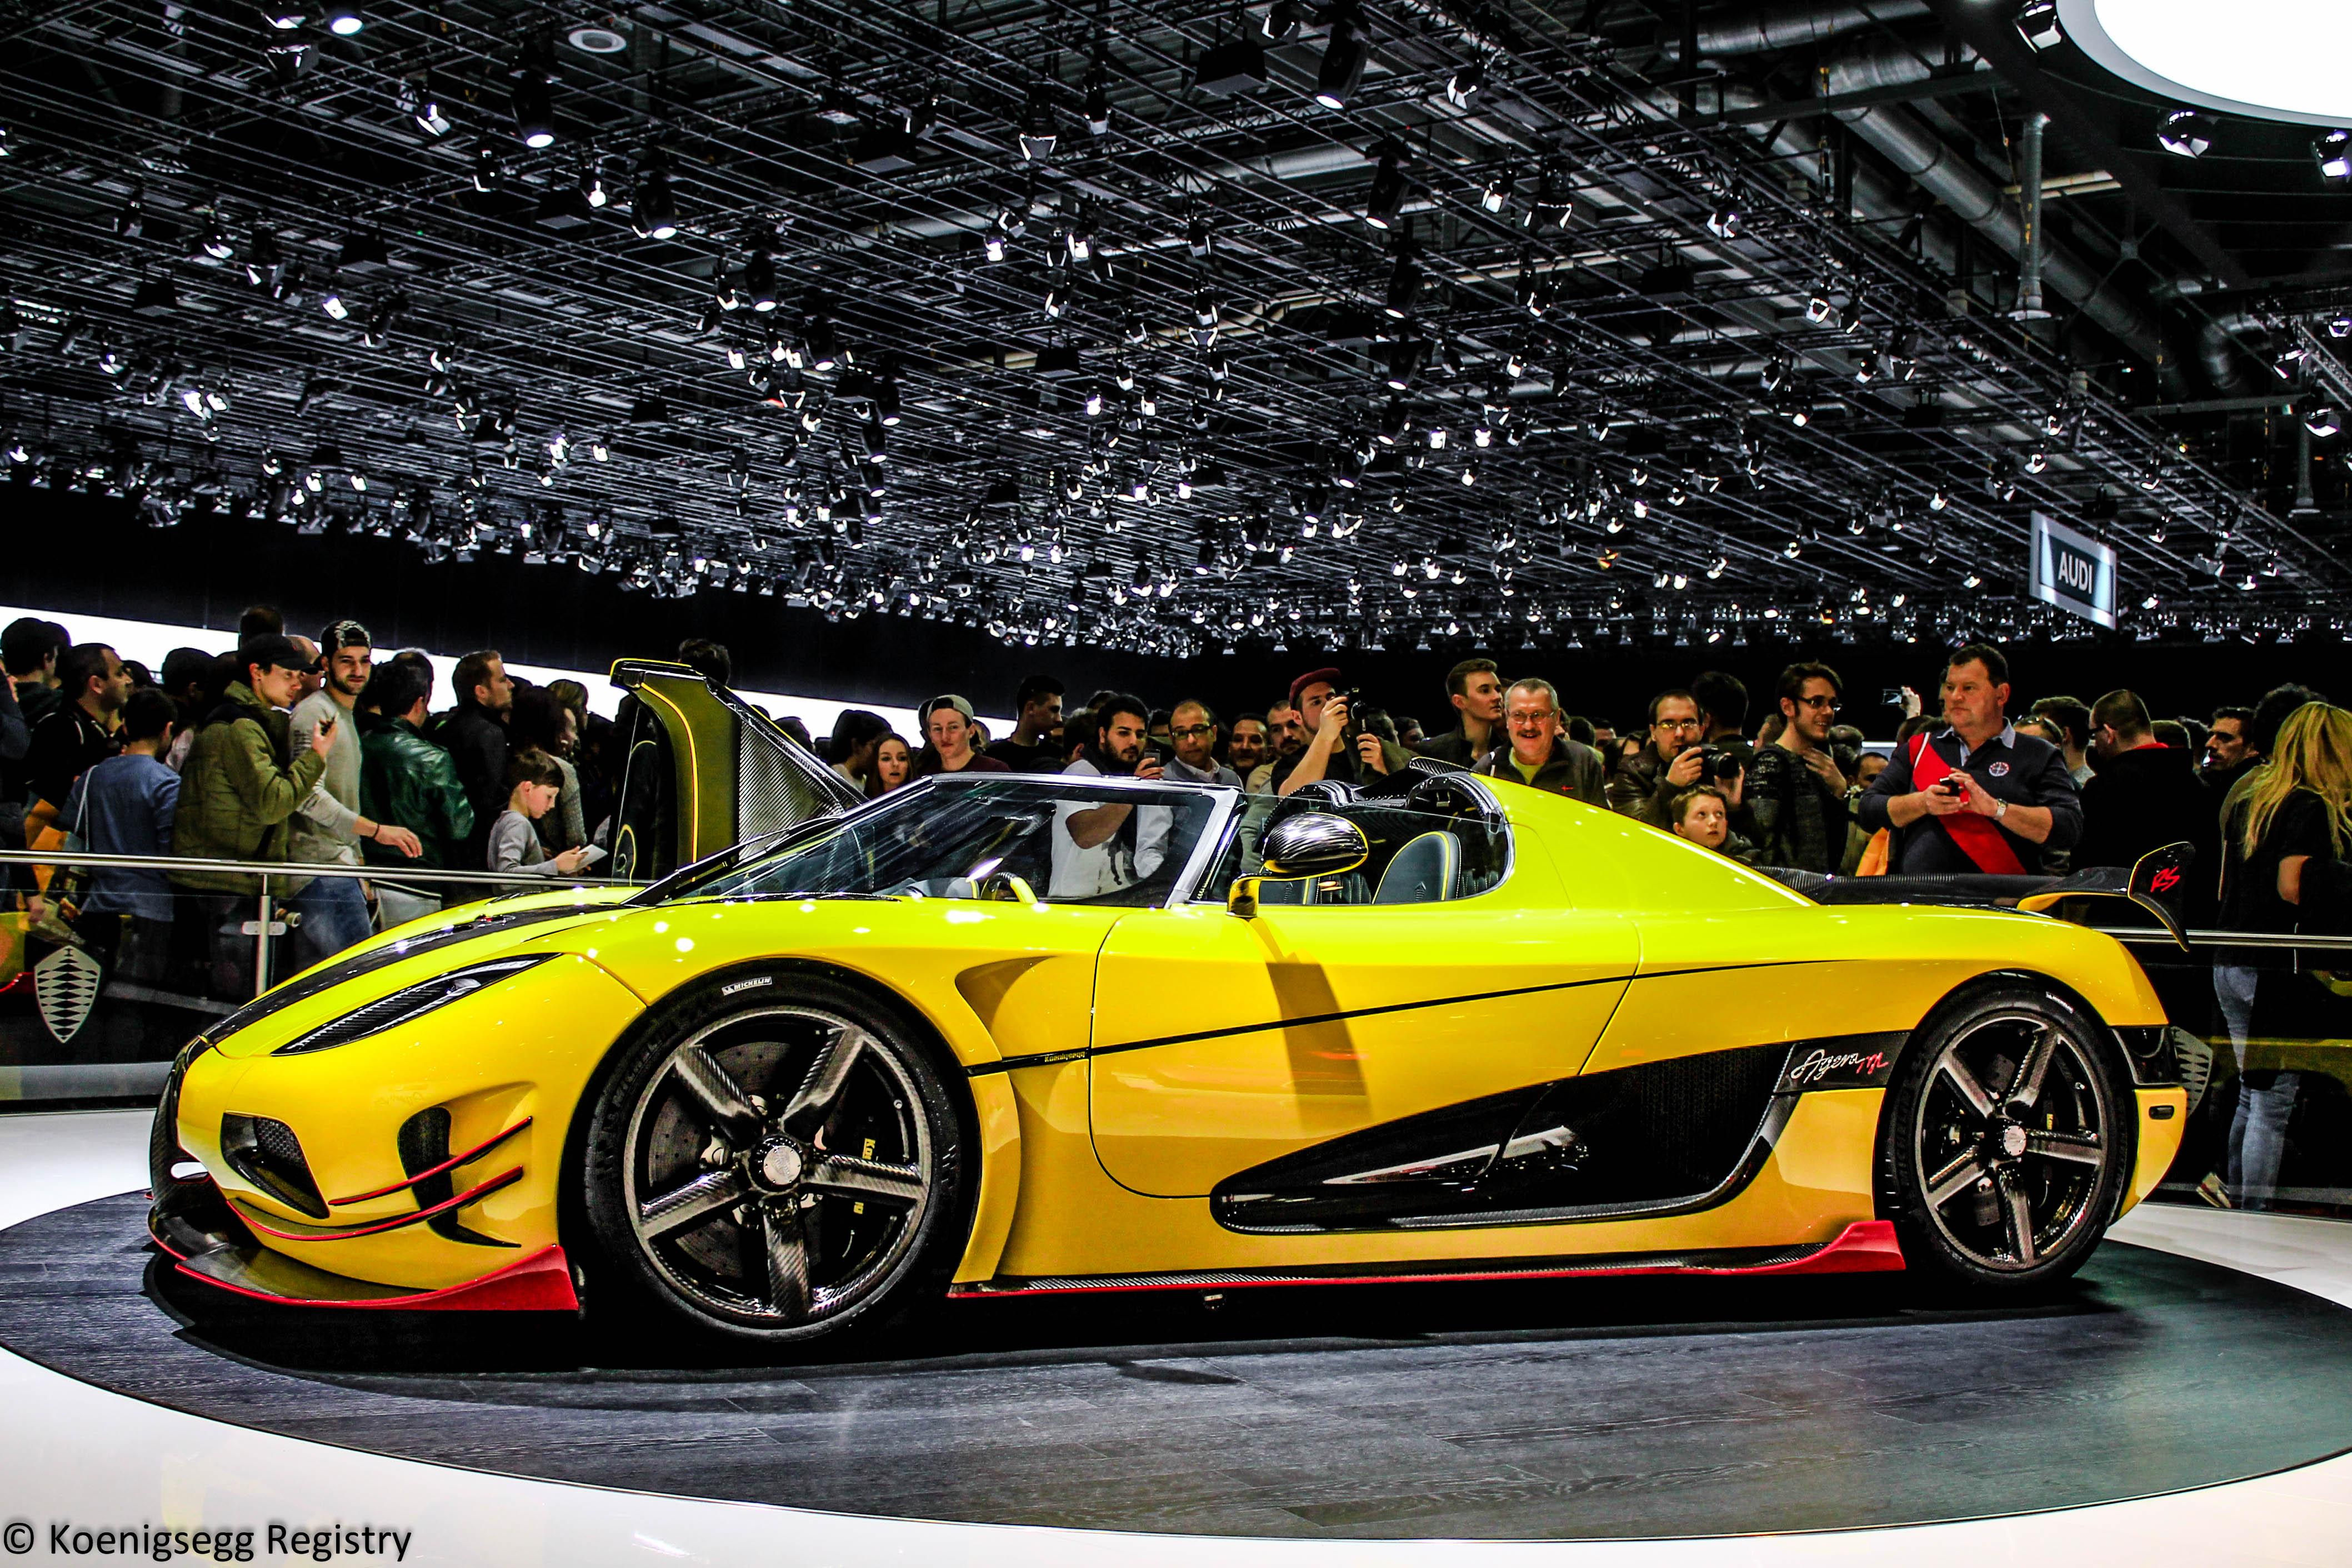 "#118 Agera RS ""ML"" - Loke Yellow w/red accents / black int. RHD-img_3644.jpg"